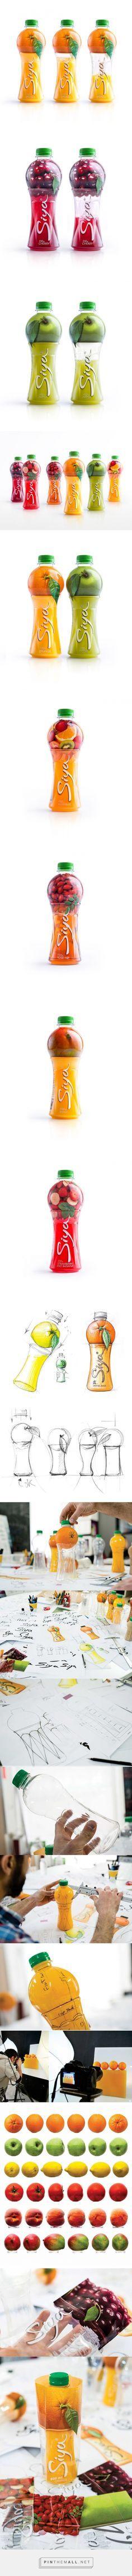 Fruit + juice glass = Fresh juice packaging - design by Backbone Branding (Armenia) - http://www.packagingoftheworld.com/2016/04/siya.html